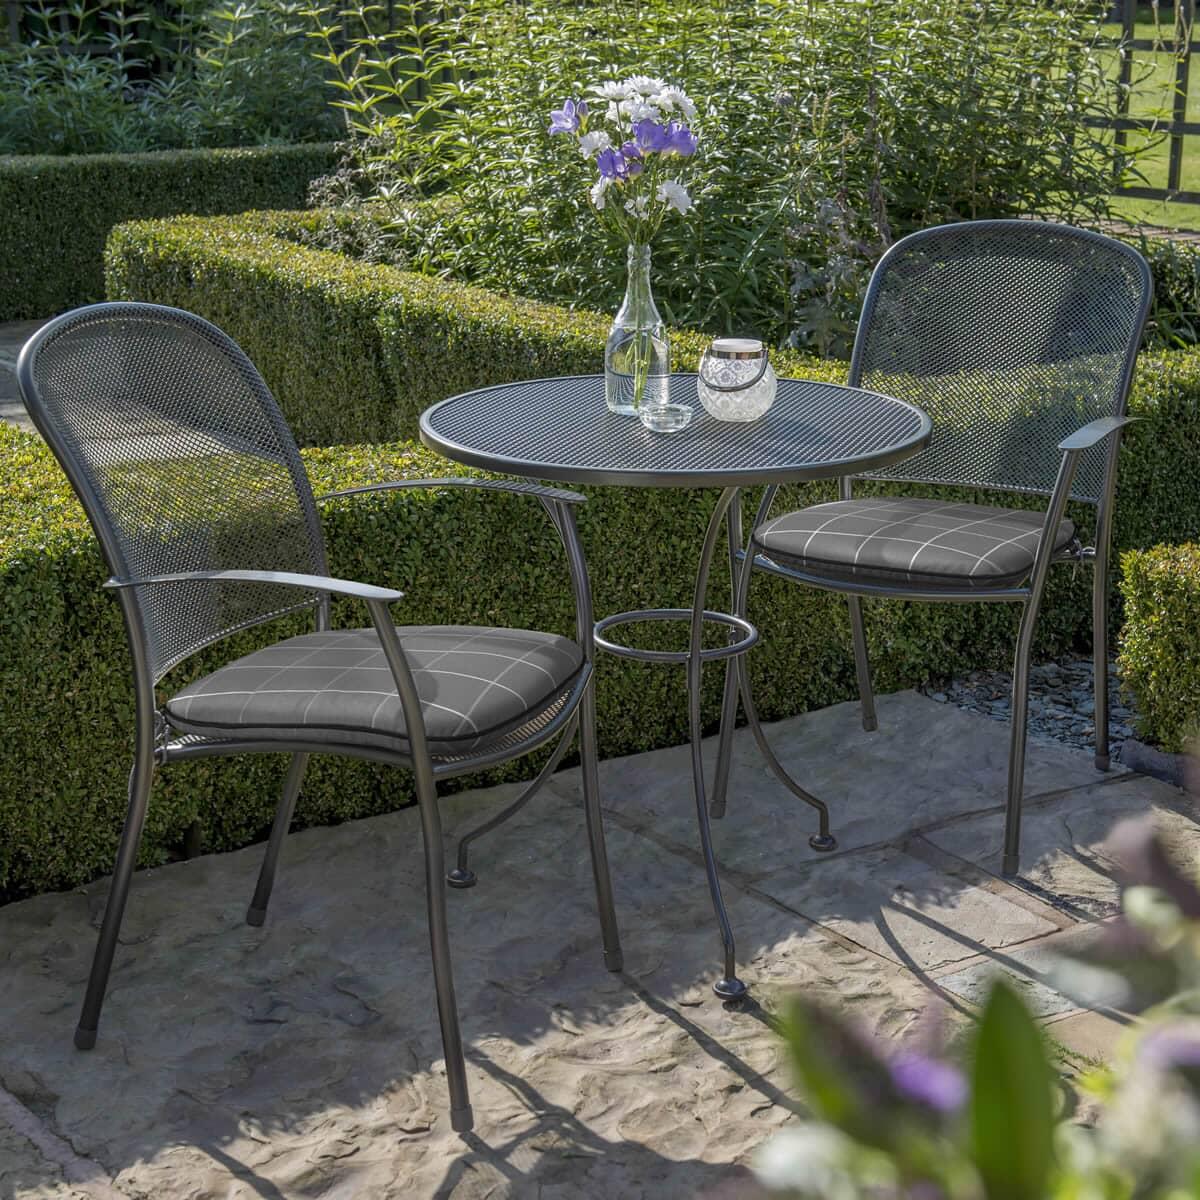 Kettler Caredo 11 Seater Set - (KCGCARSET11) - Garden Furniture World